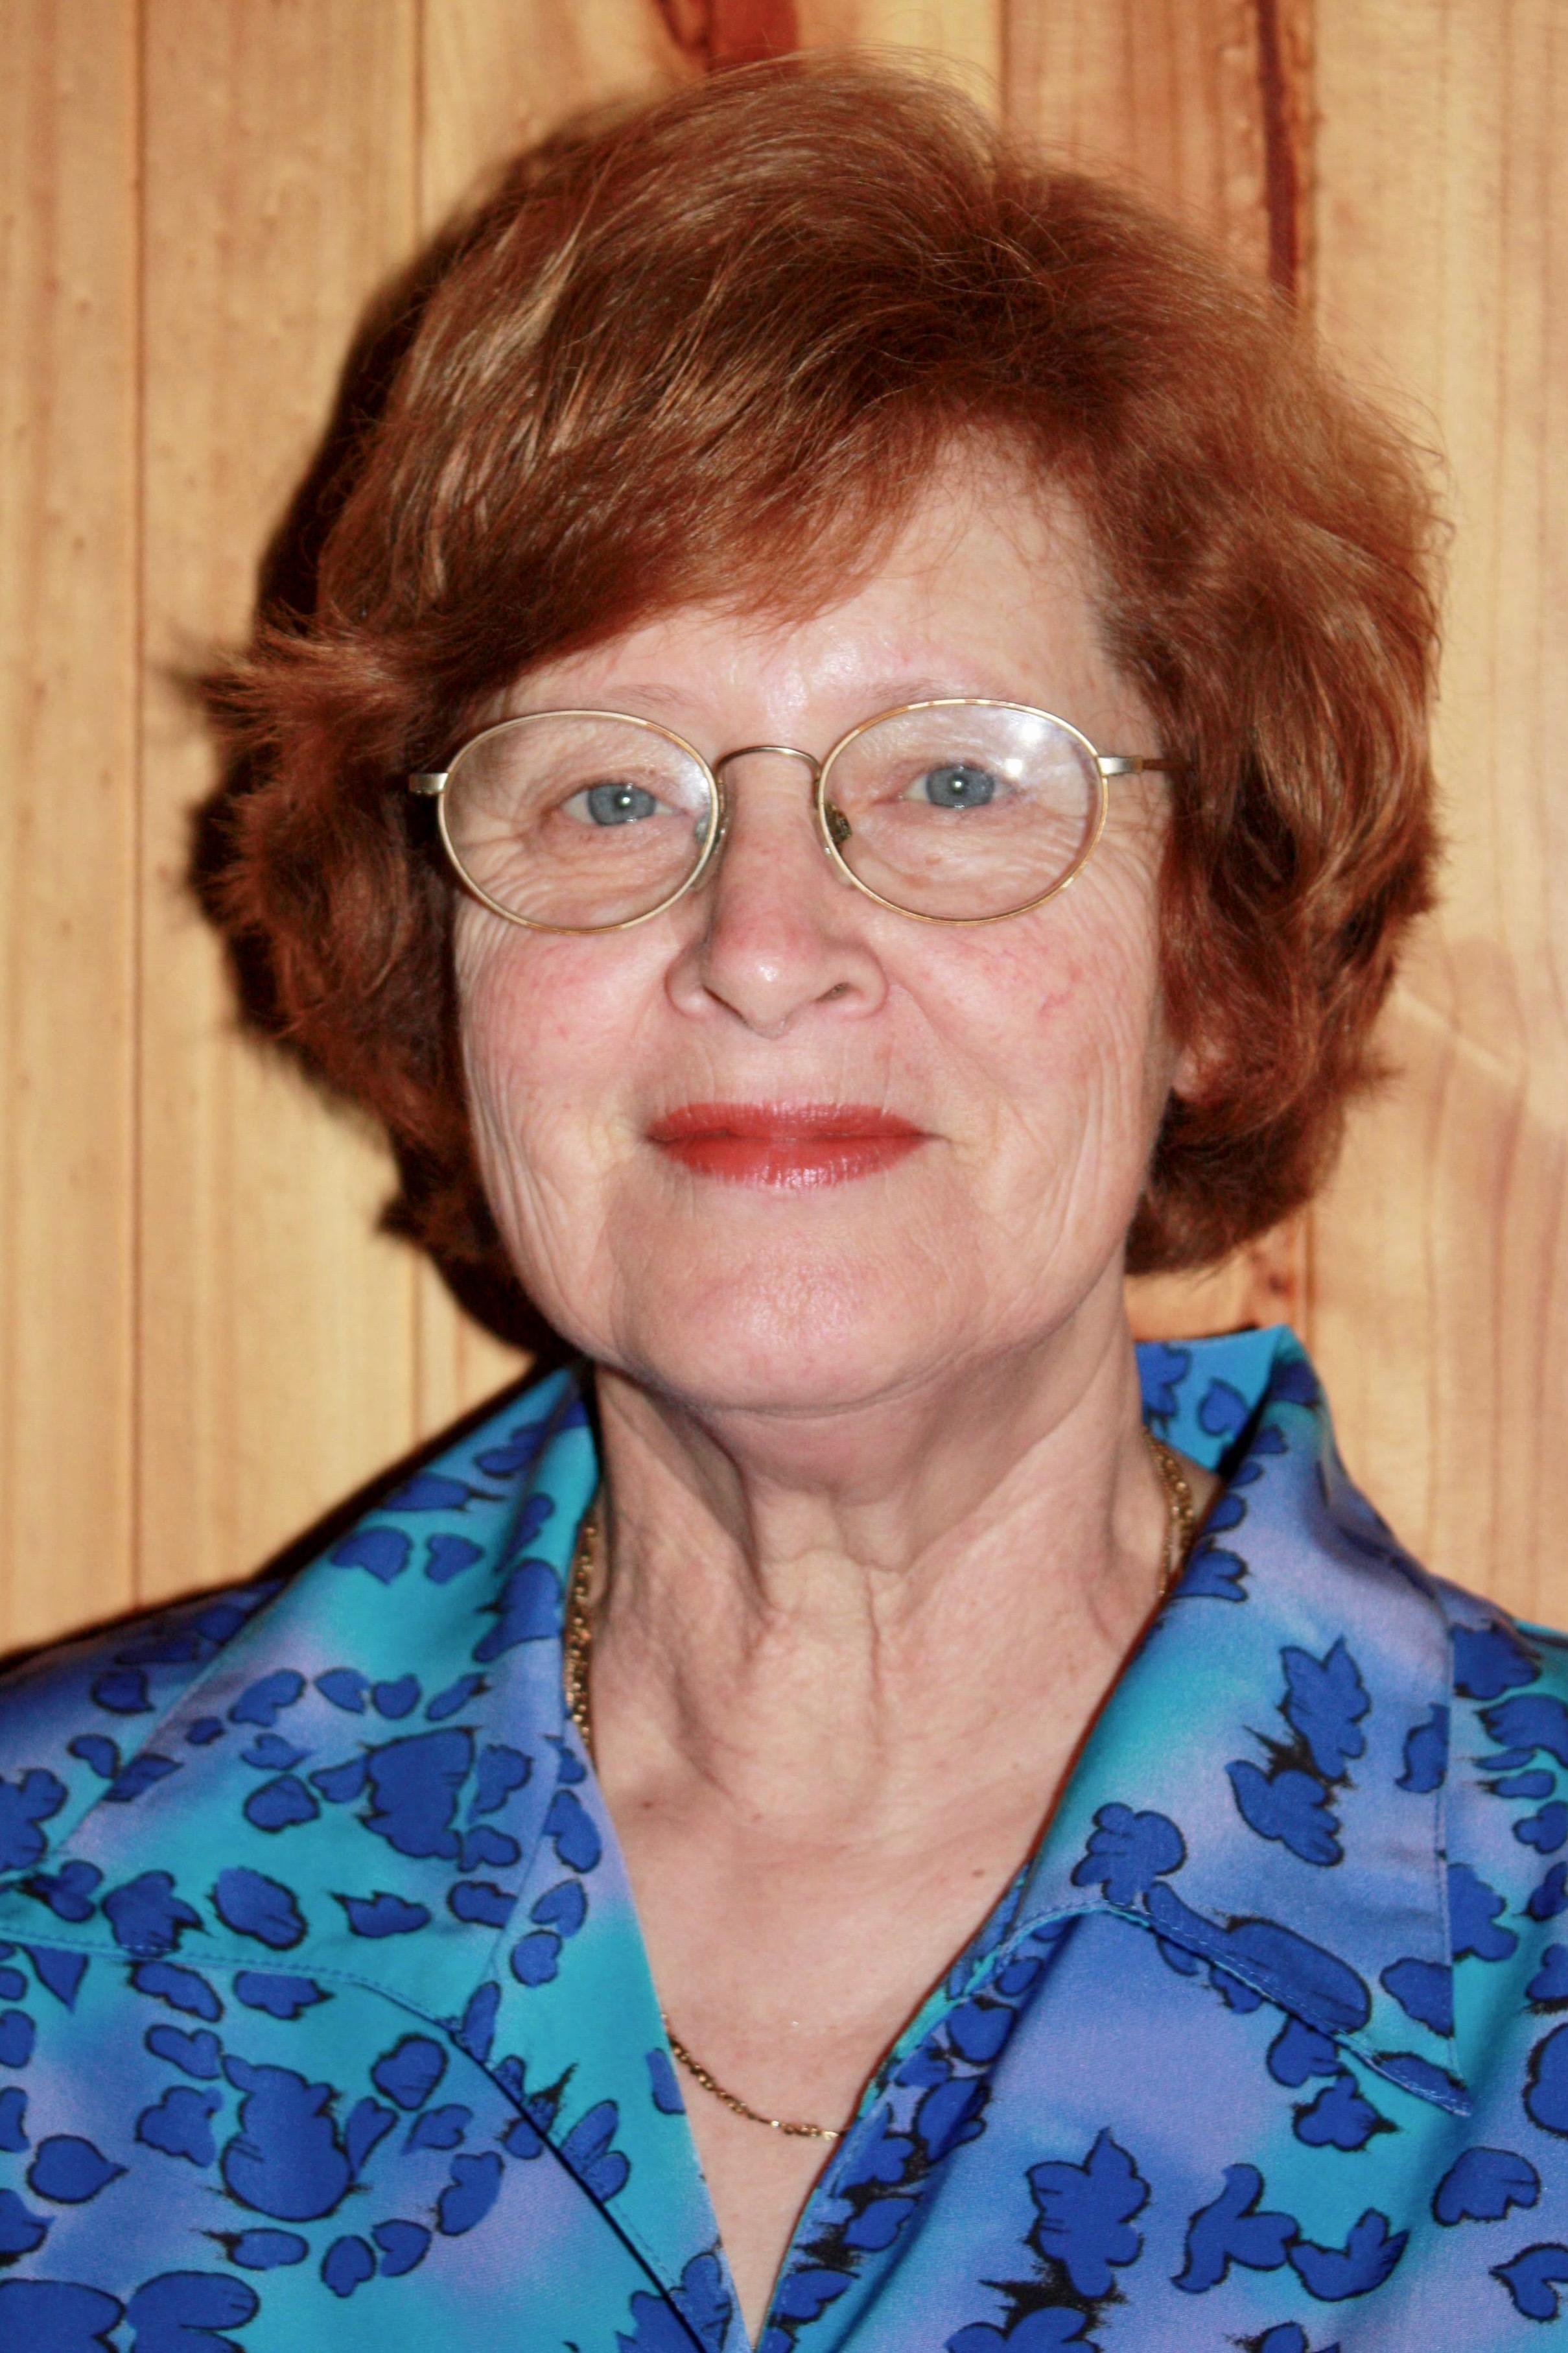 Janene Swalwell